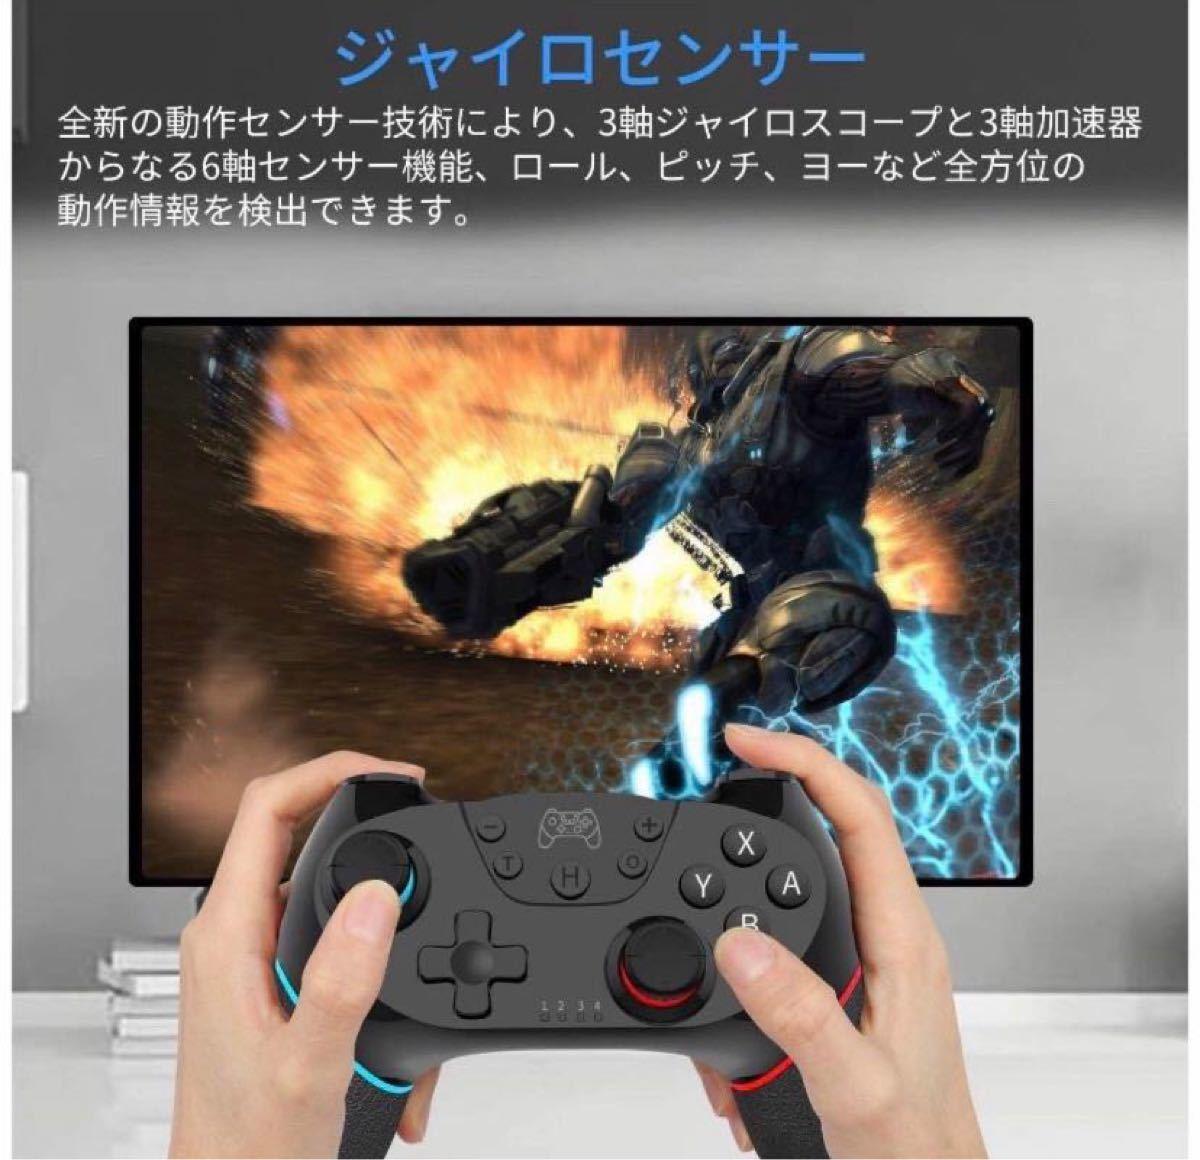 Switch コントローラー スイッチ  ワイヤレス プロコン 日本語取扱説明書